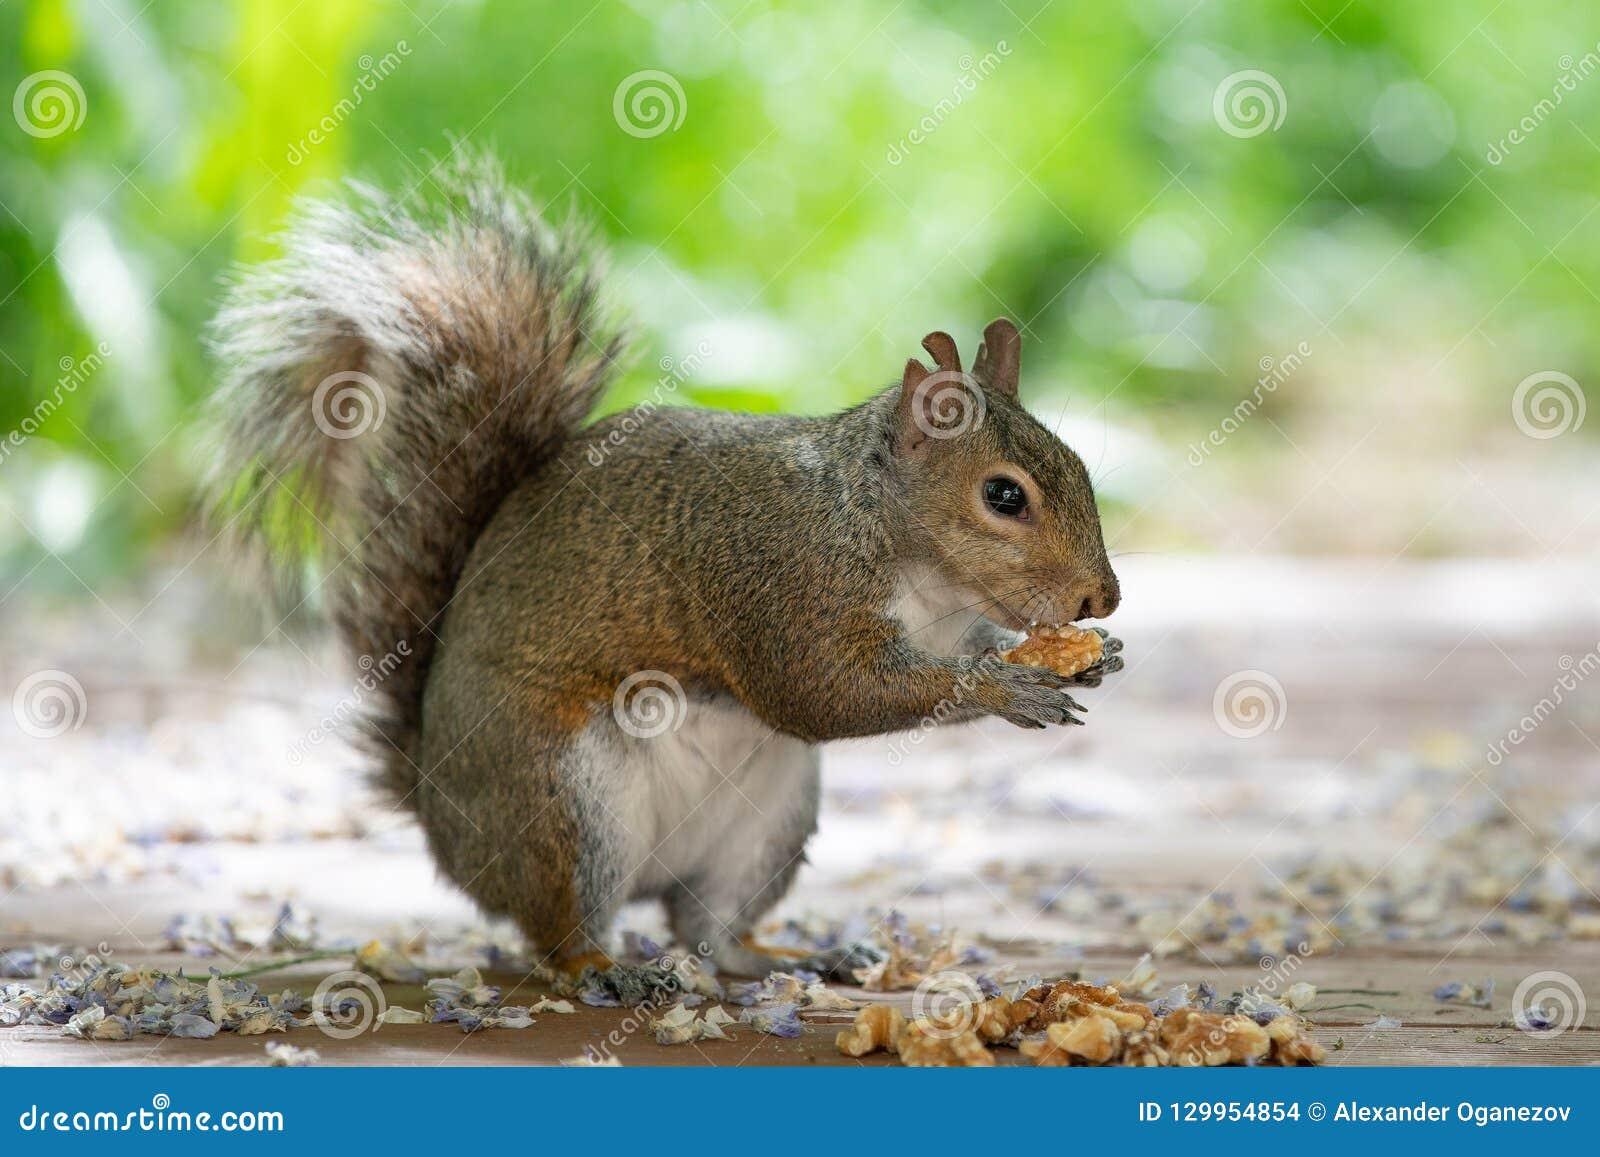 Baby brown furry squirrel holding walnut